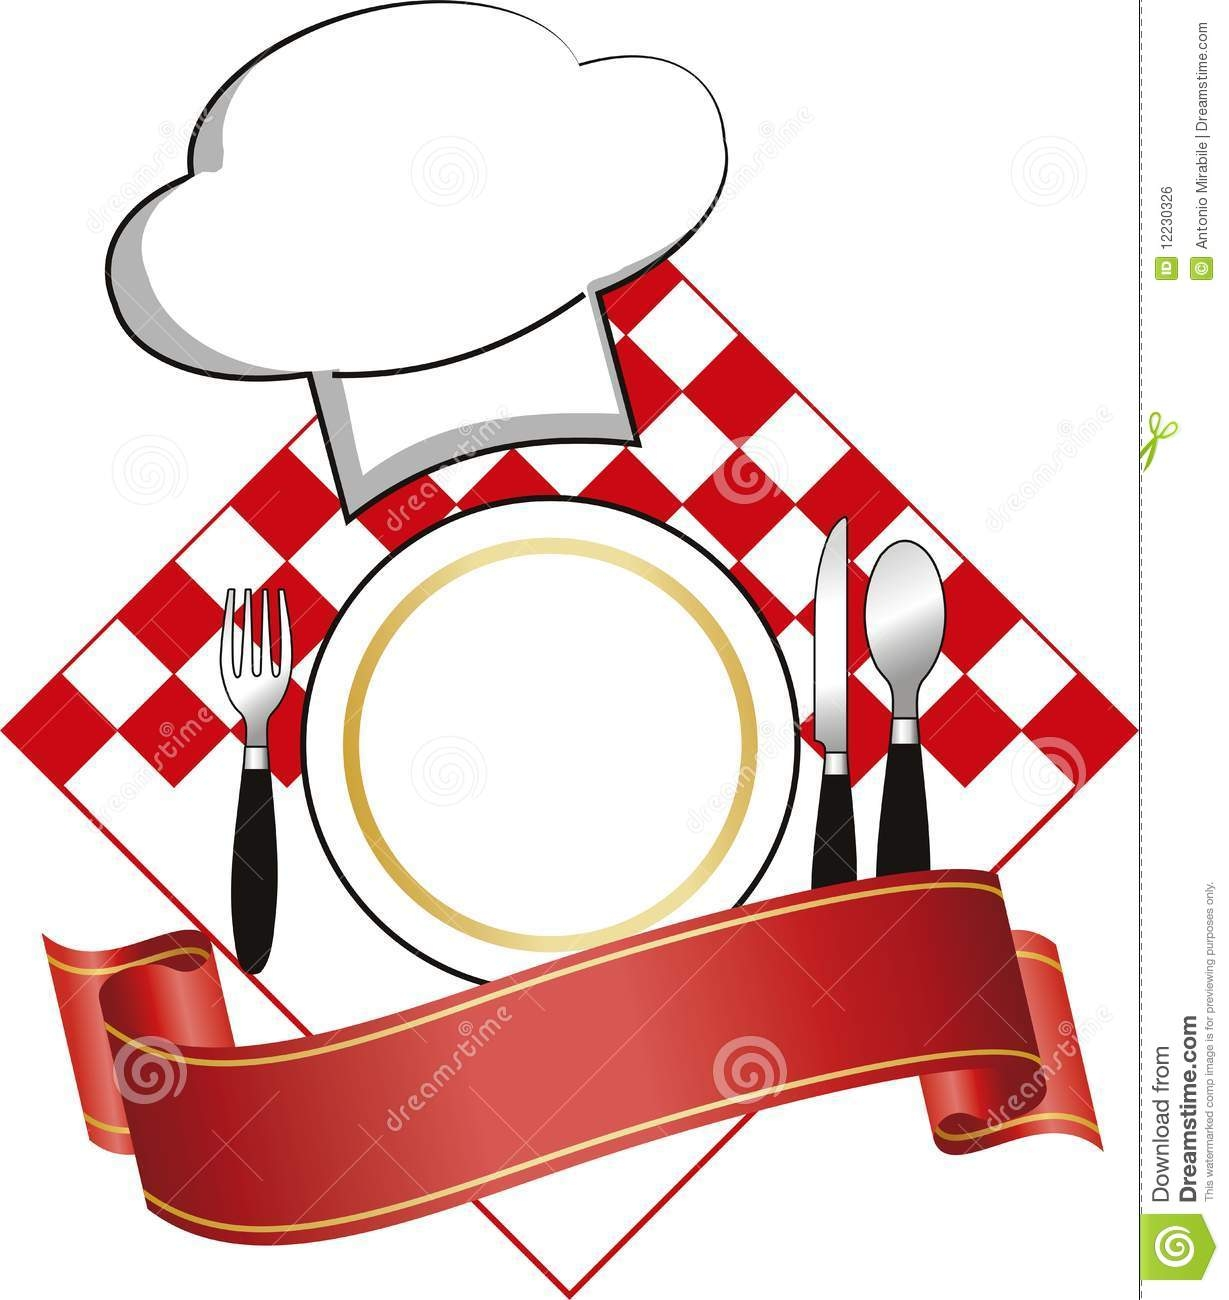 Logo clipart restaurant Restaurant clipartsgram Restaurant Logo Clipart